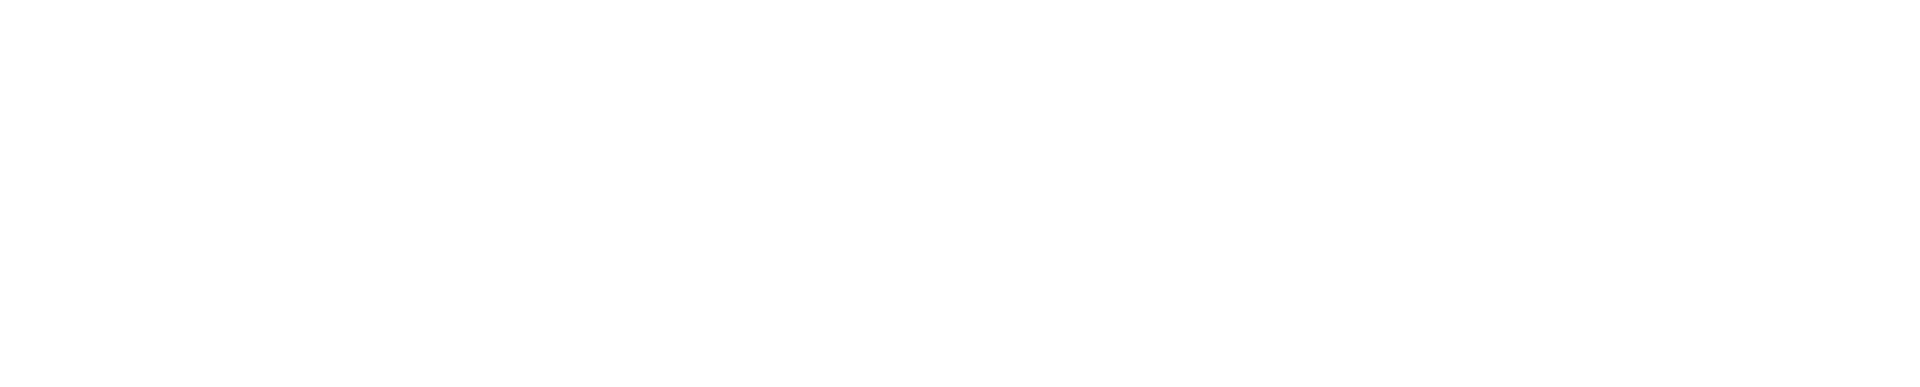 Symplicity Horizons